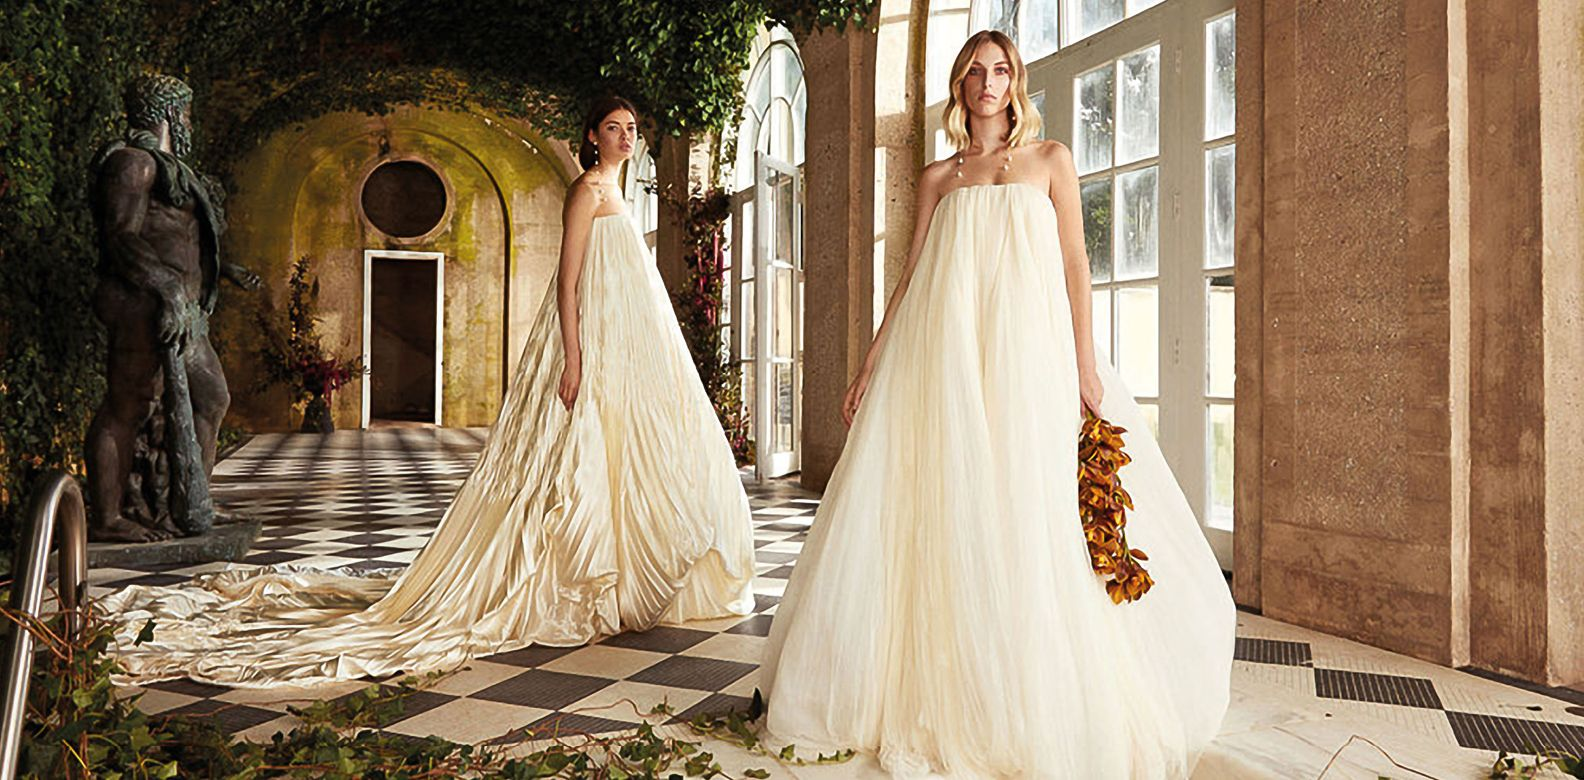 Fairy Tale Reinvented: Wedding Dress Designer Danielle Frankel